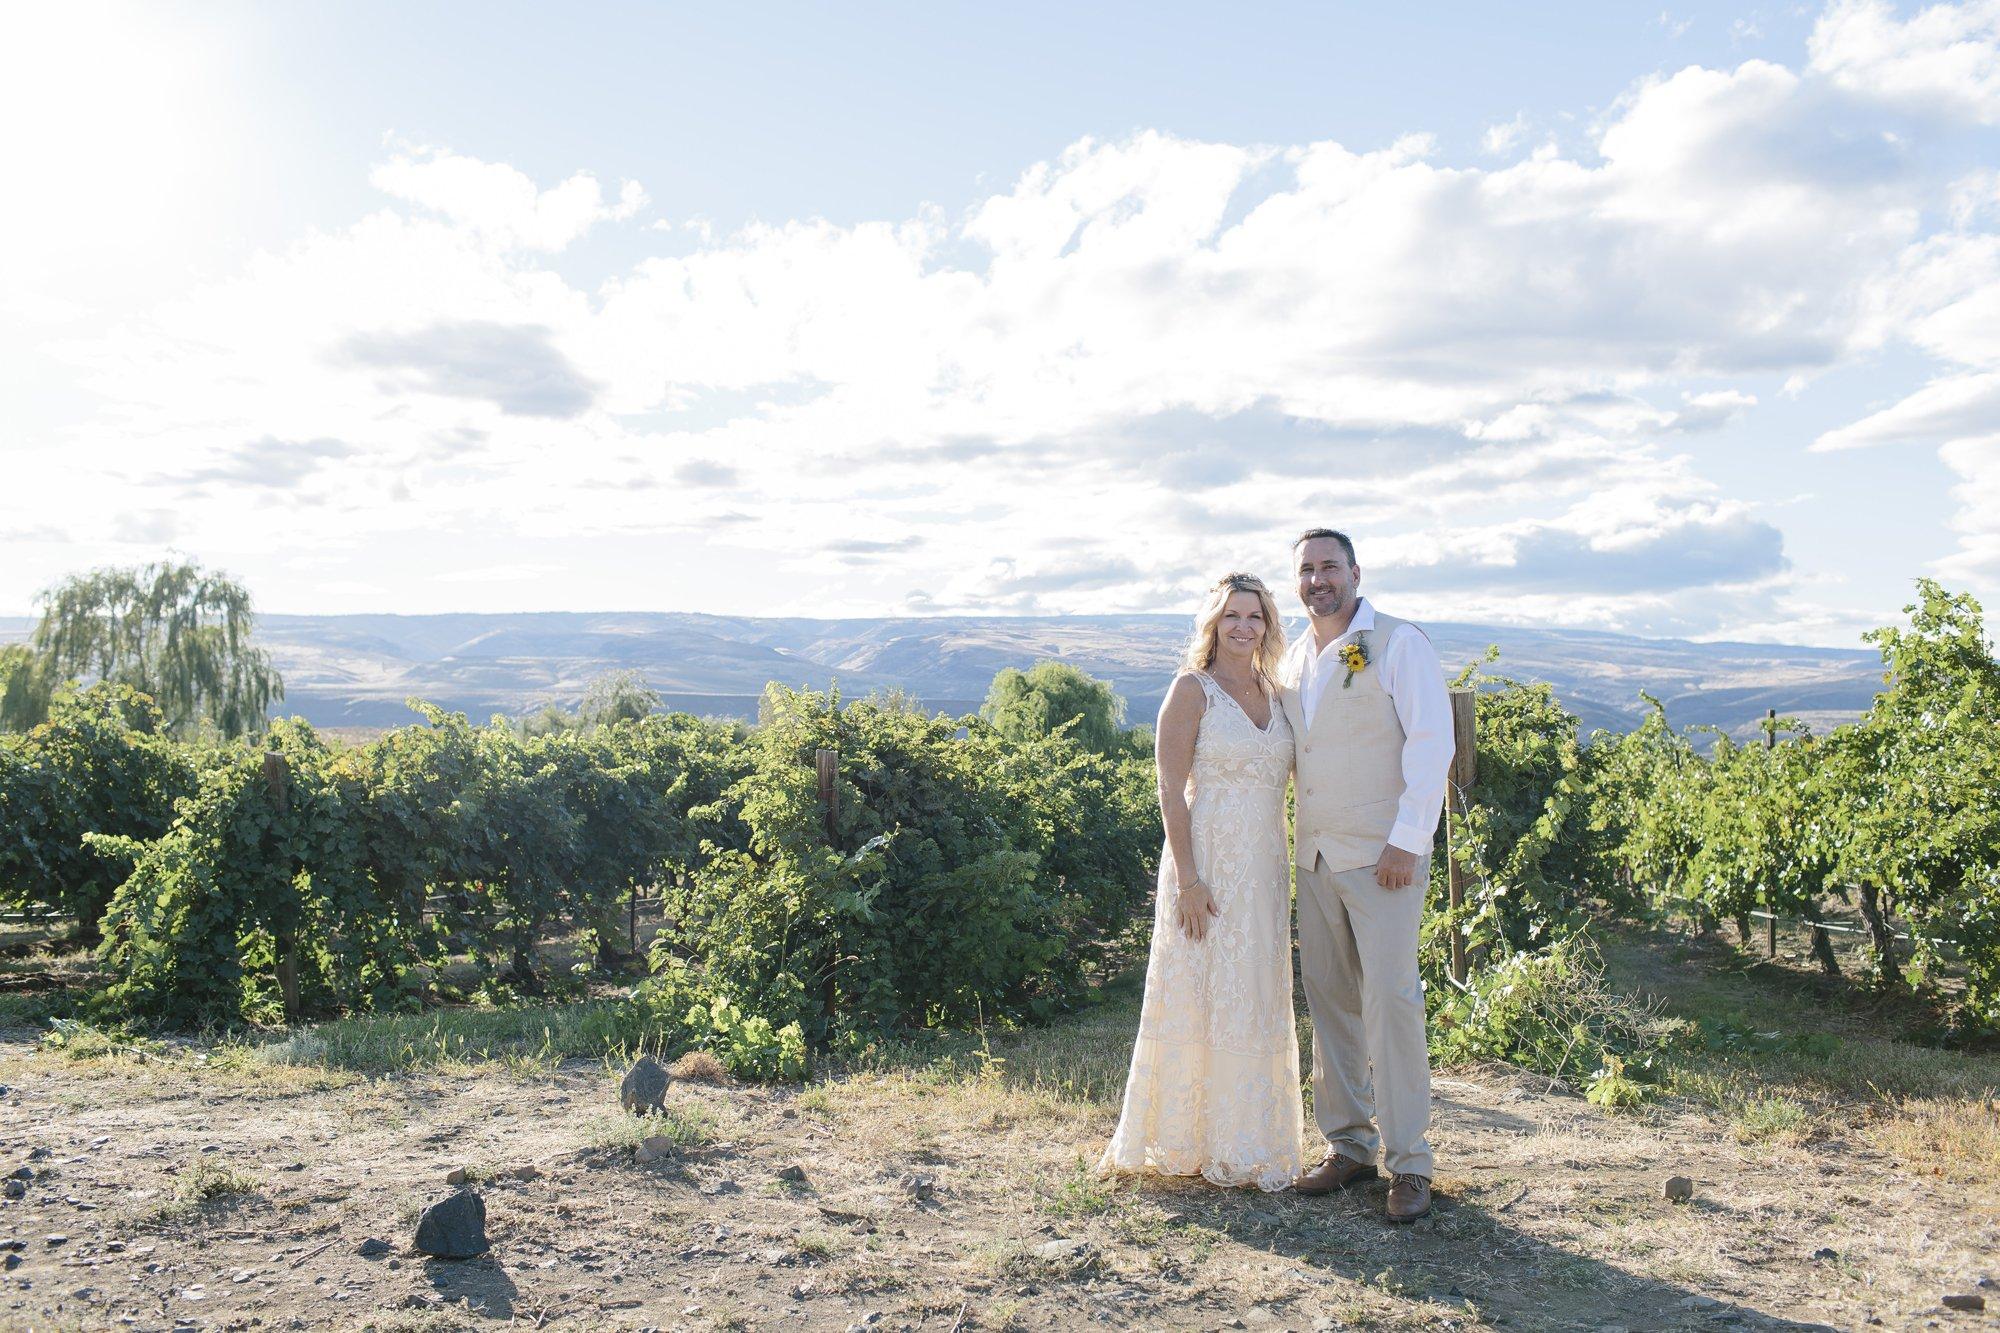 Leslie & Drew's Cave B Winery Elopement